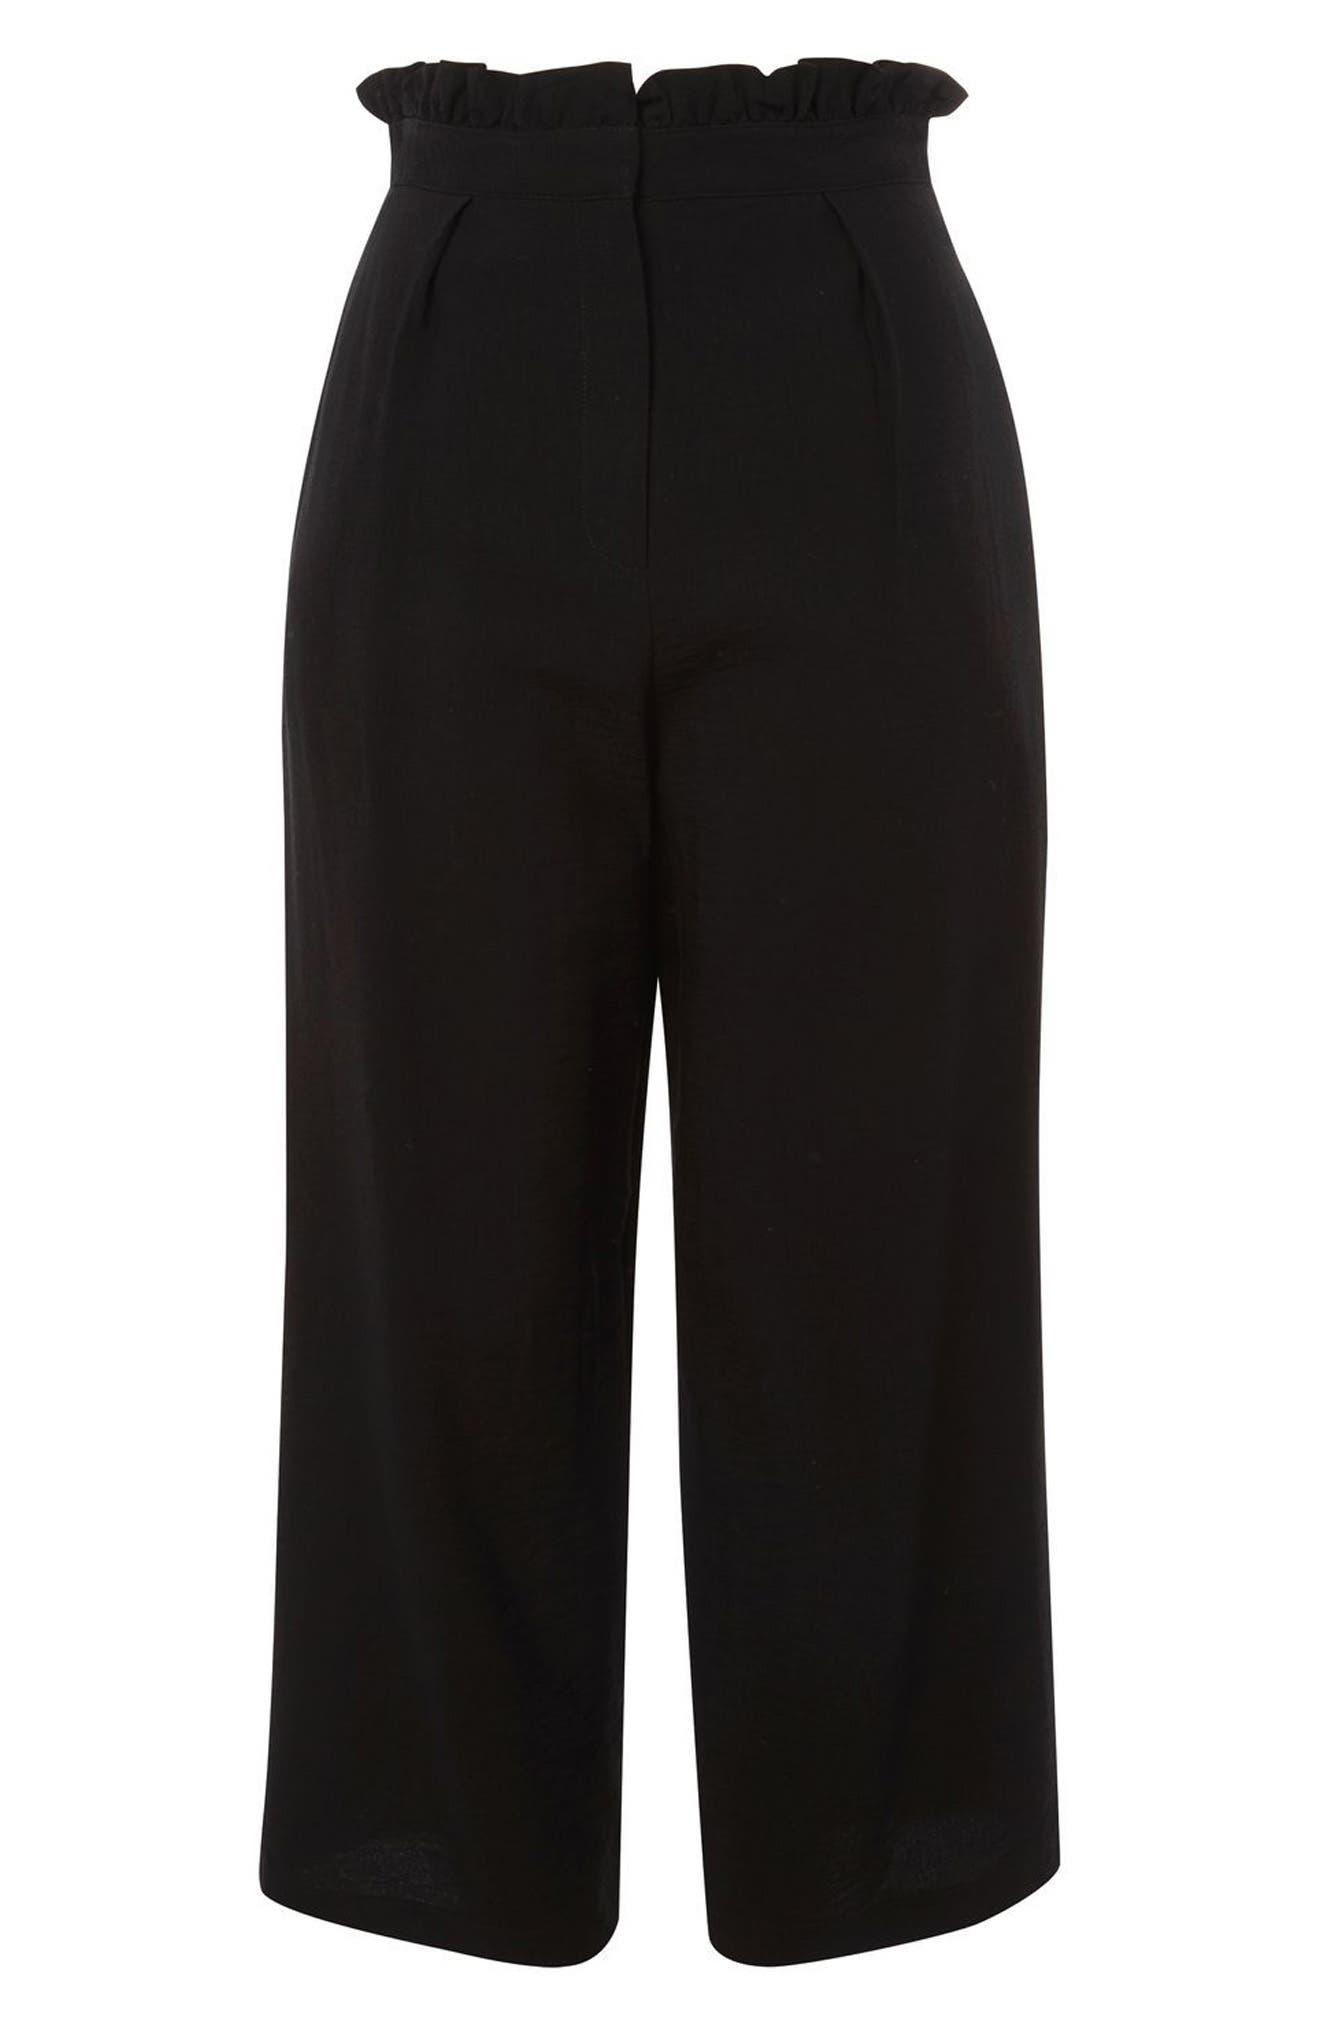 TOPSHOP, Ruffle Waist Trousers, Alternate thumbnail 3, color, 001